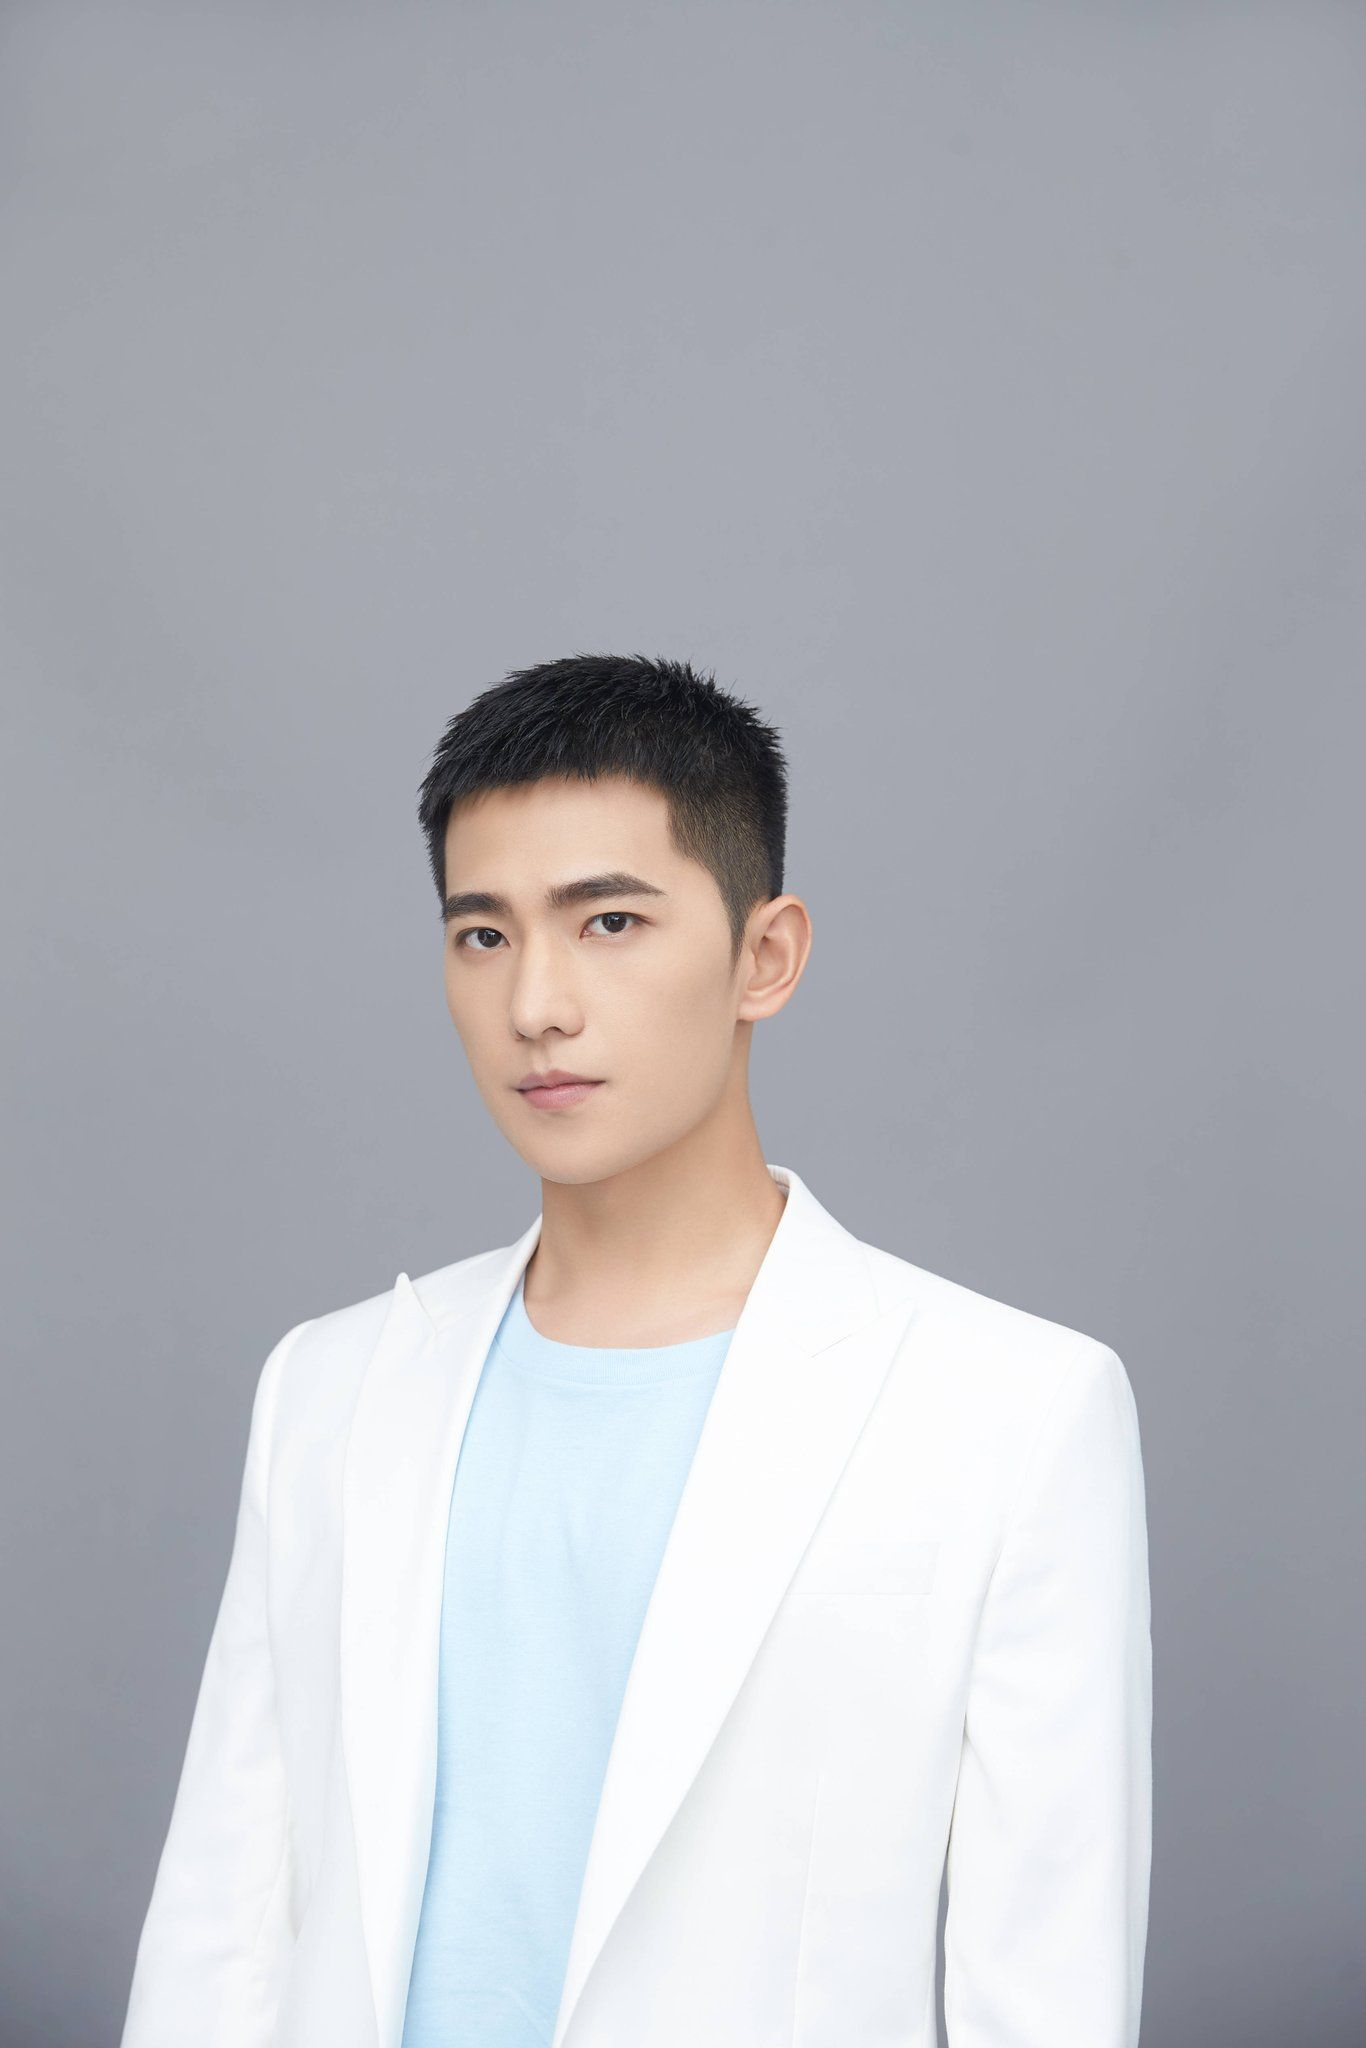 Yang Yang Overseas On Twitter Mens Hairstyles Asian Man Haircut Haircuts For Men